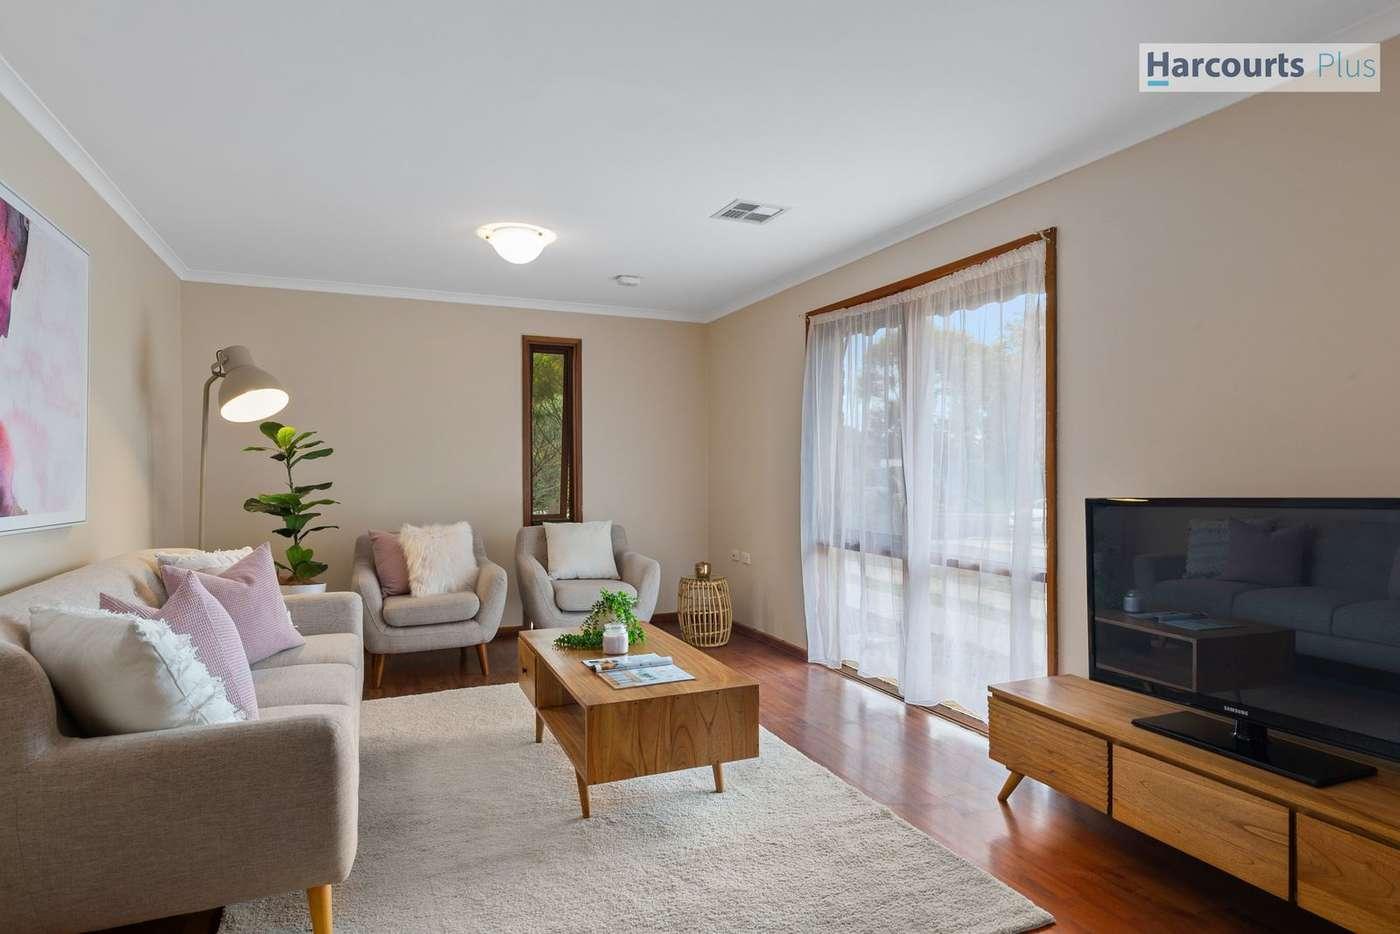 Main view of Homely house listing, 4 Birubi Way, Morphett Vale SA 5162